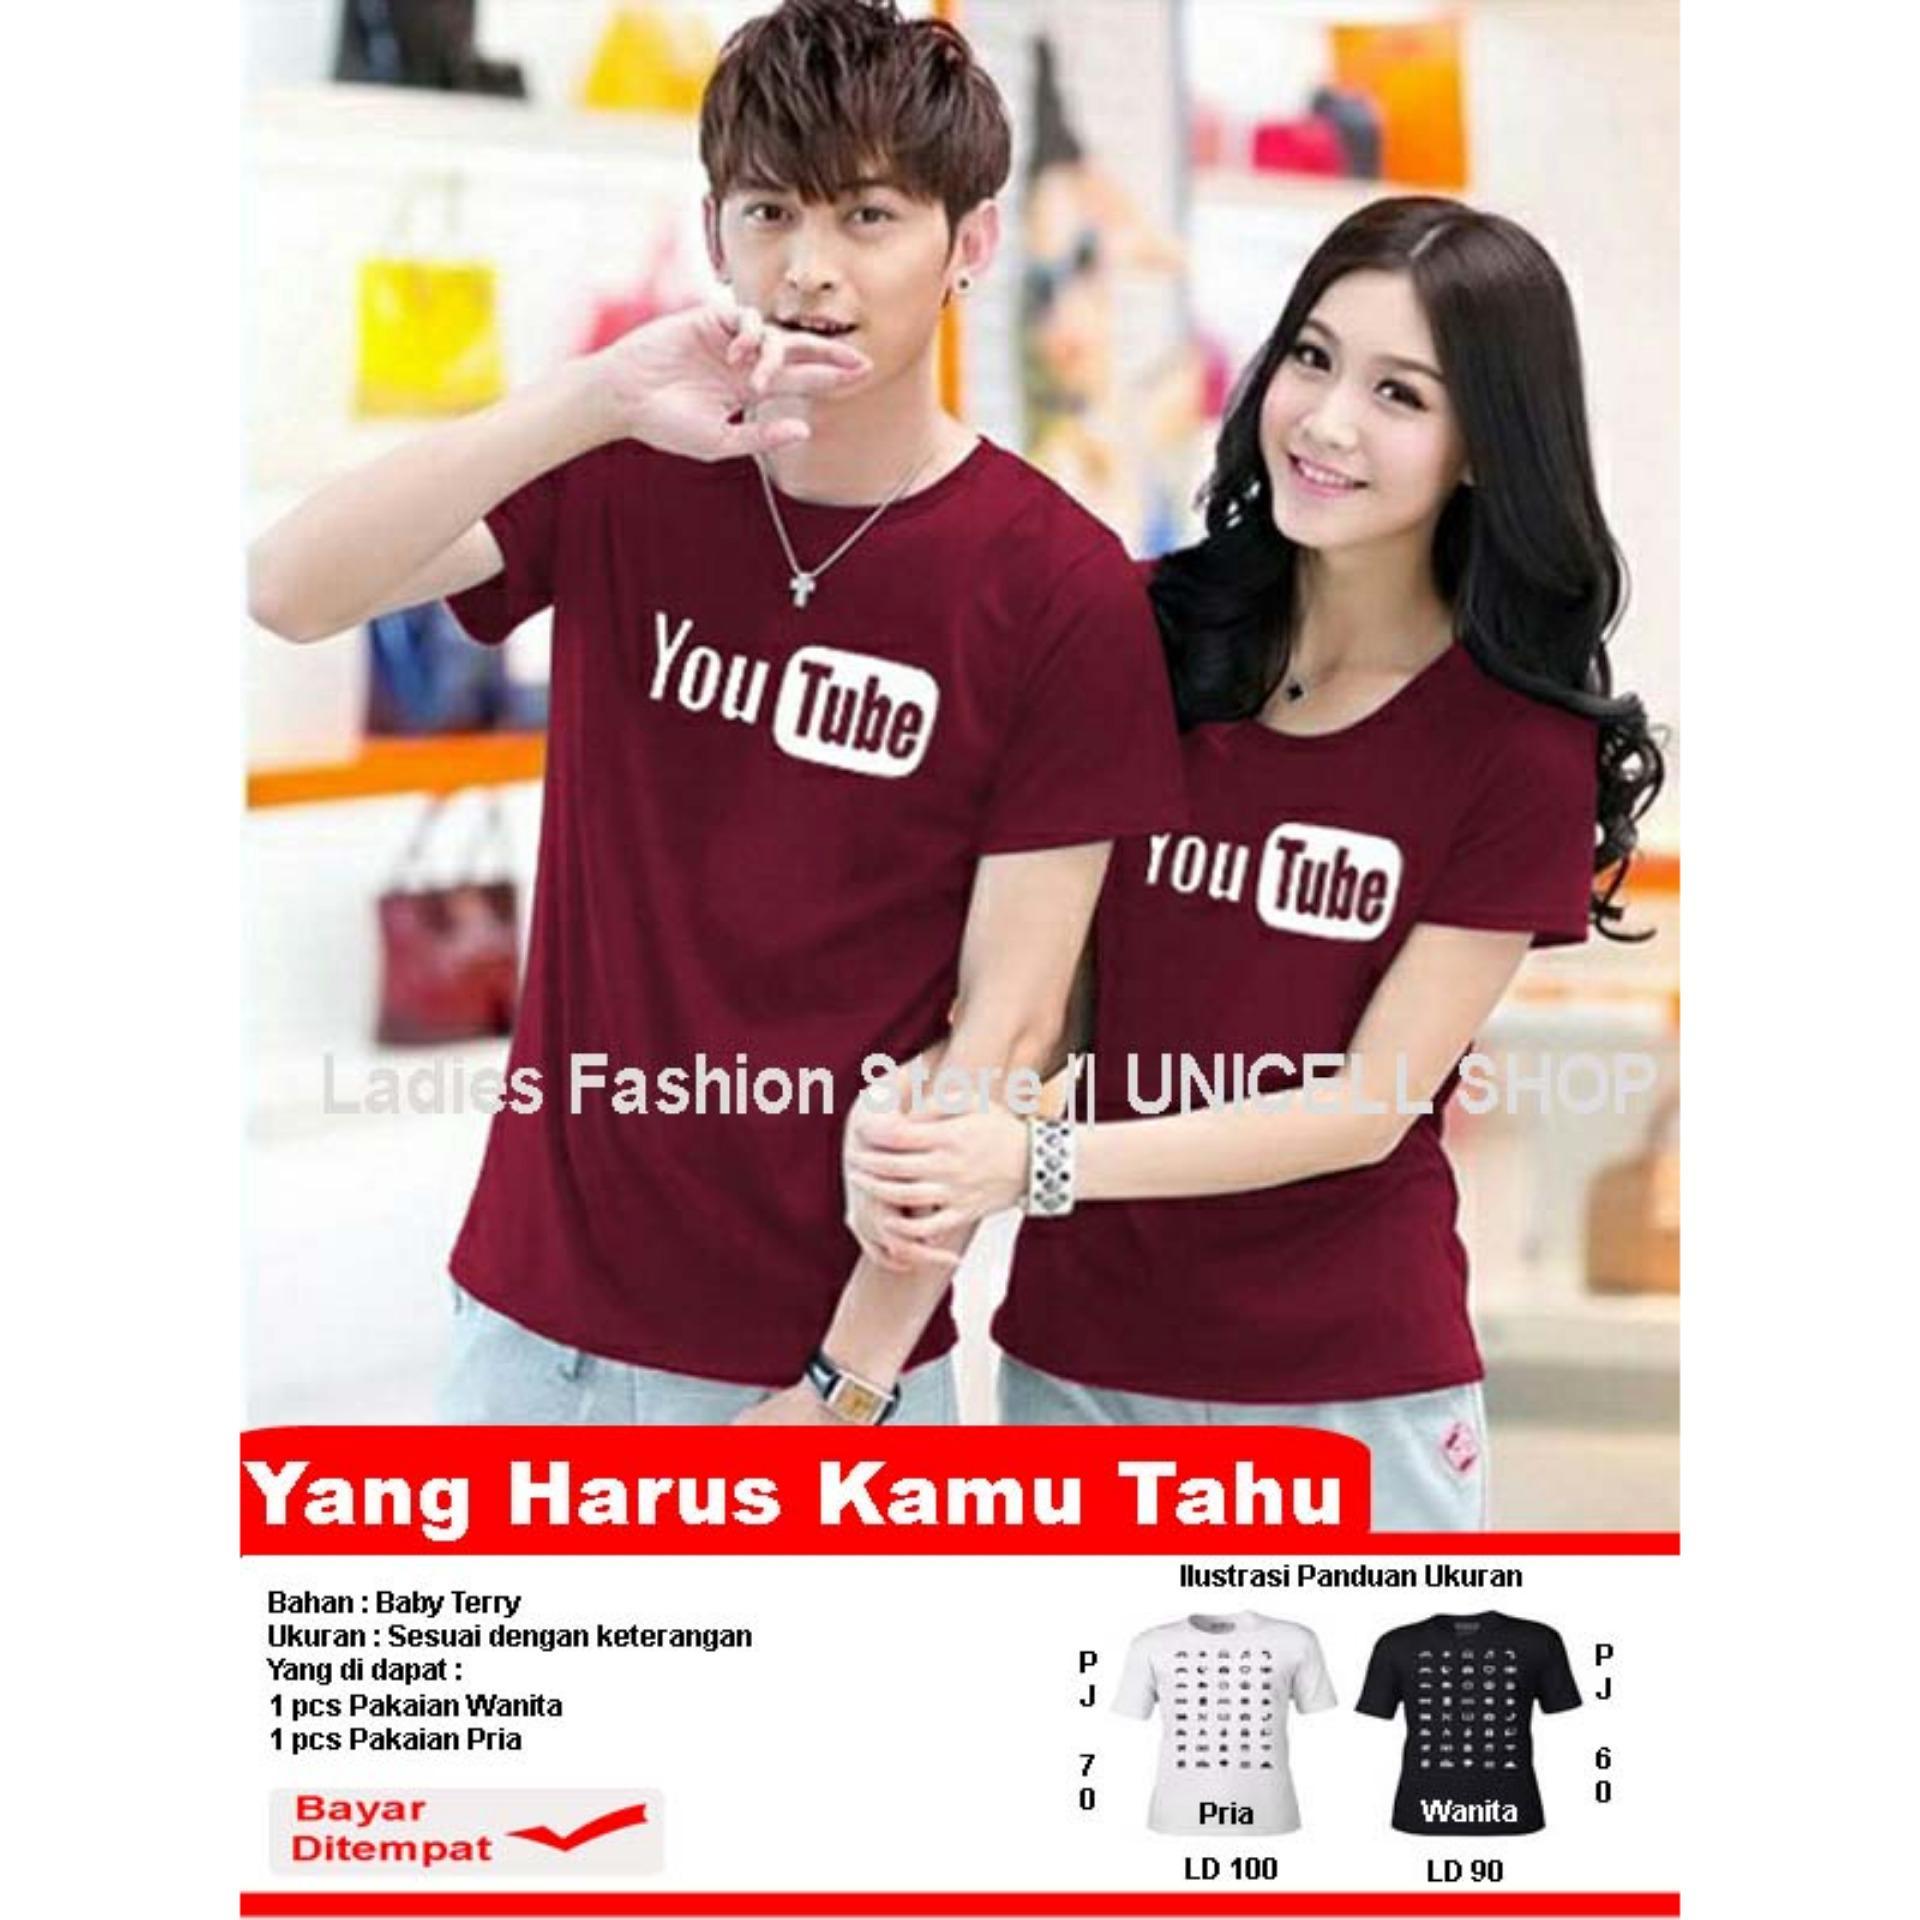 Kaos Couple Youtube / Kaos Oblong Fans Club / Kaos Murah / Tshirt Pasangan / Pakaian Kembar / Kaos Pria Wanita LC D30 - Maron D3C